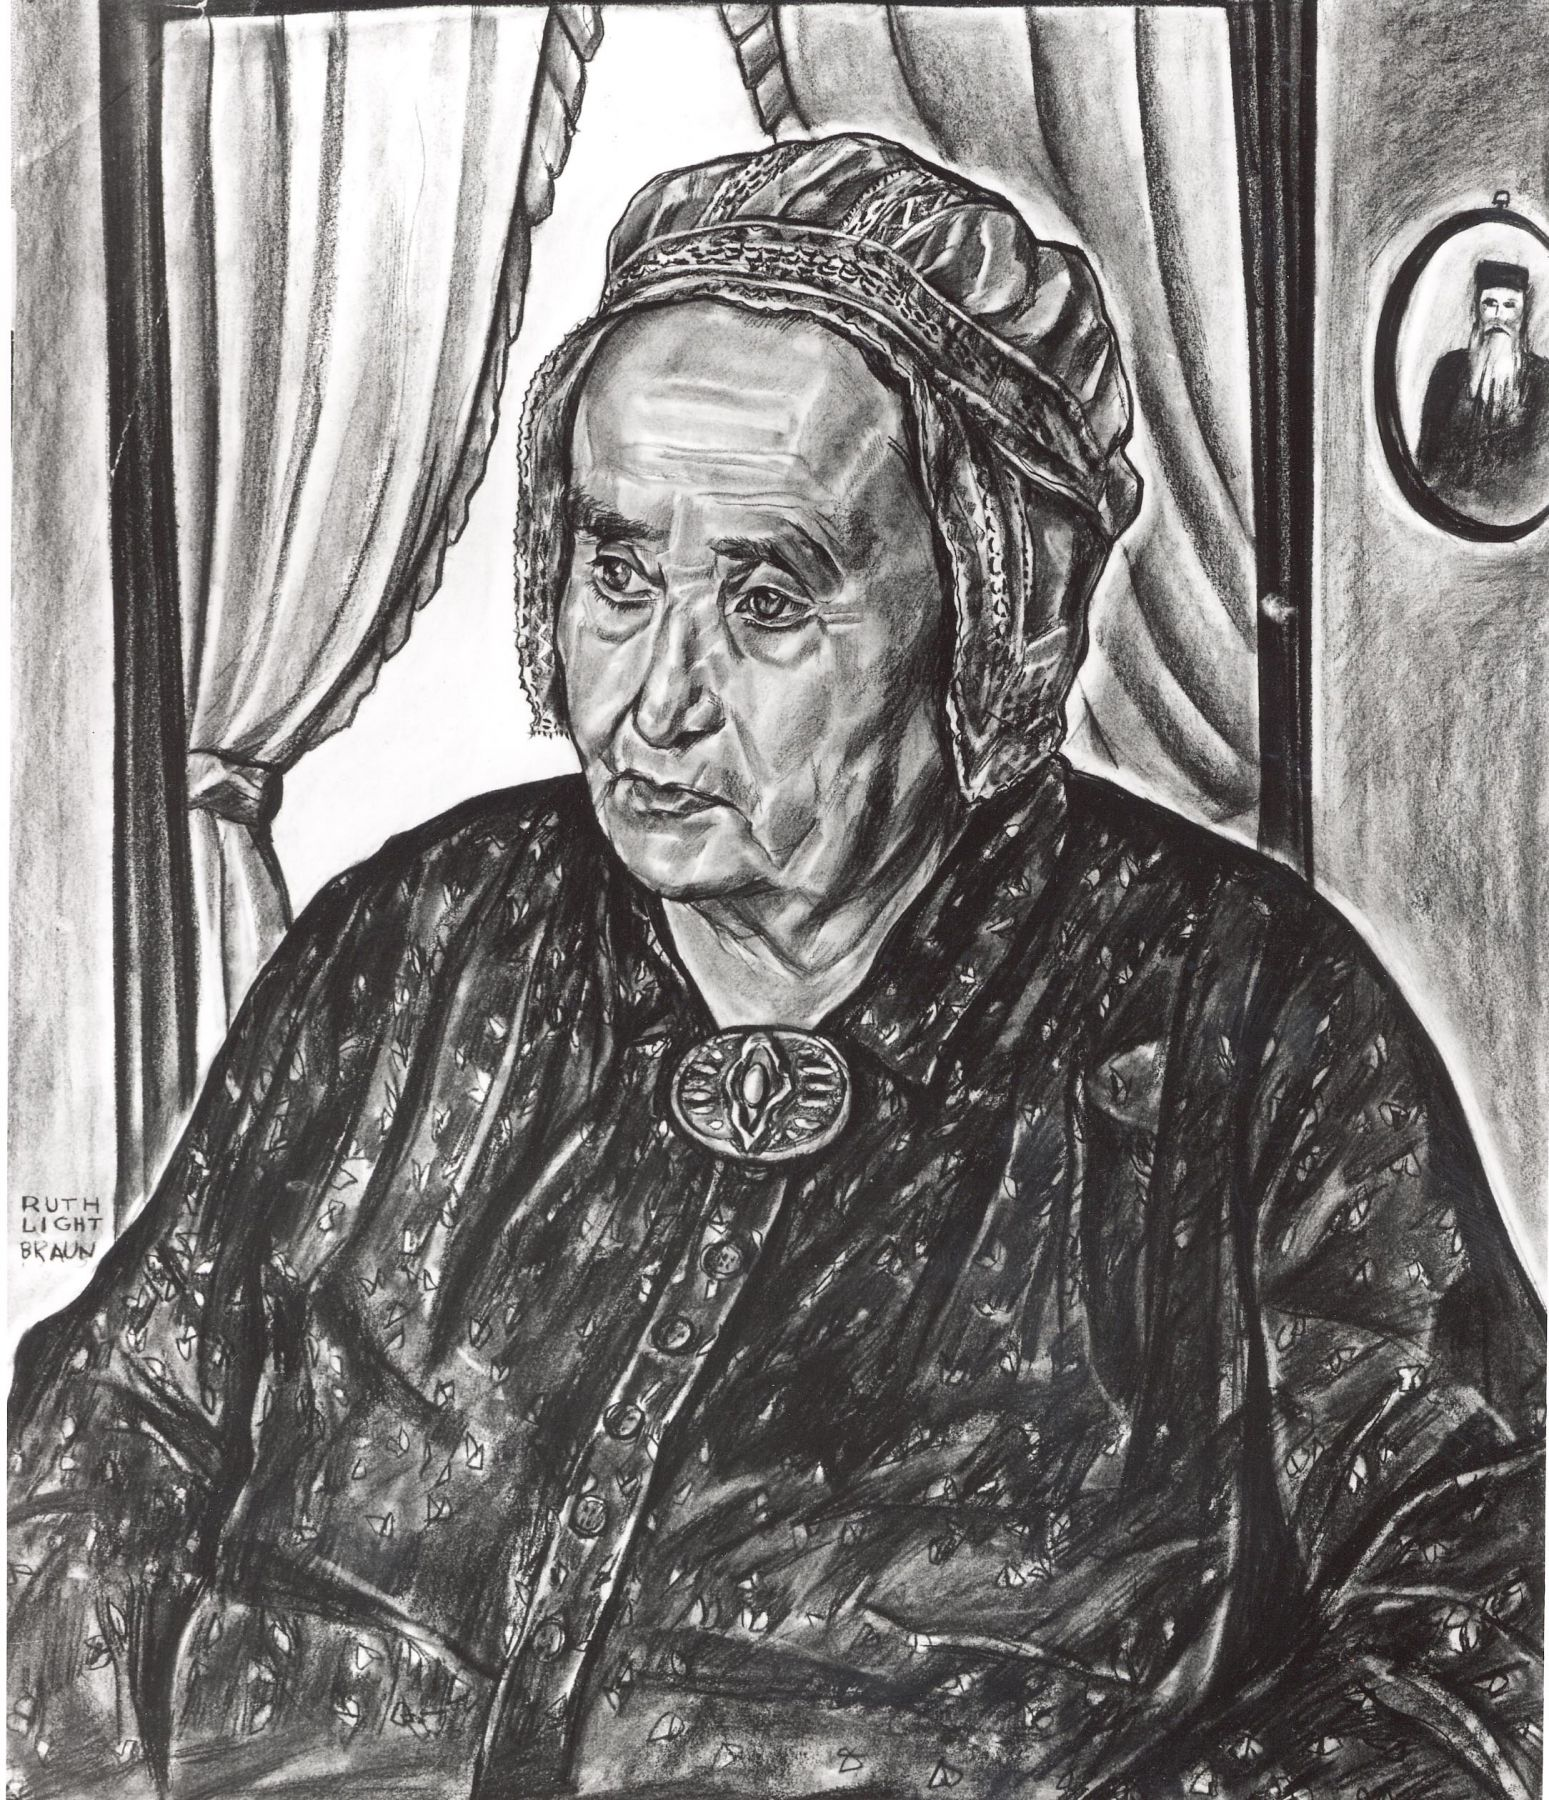 RUTH LIGHT BRAUN (1906–2003)